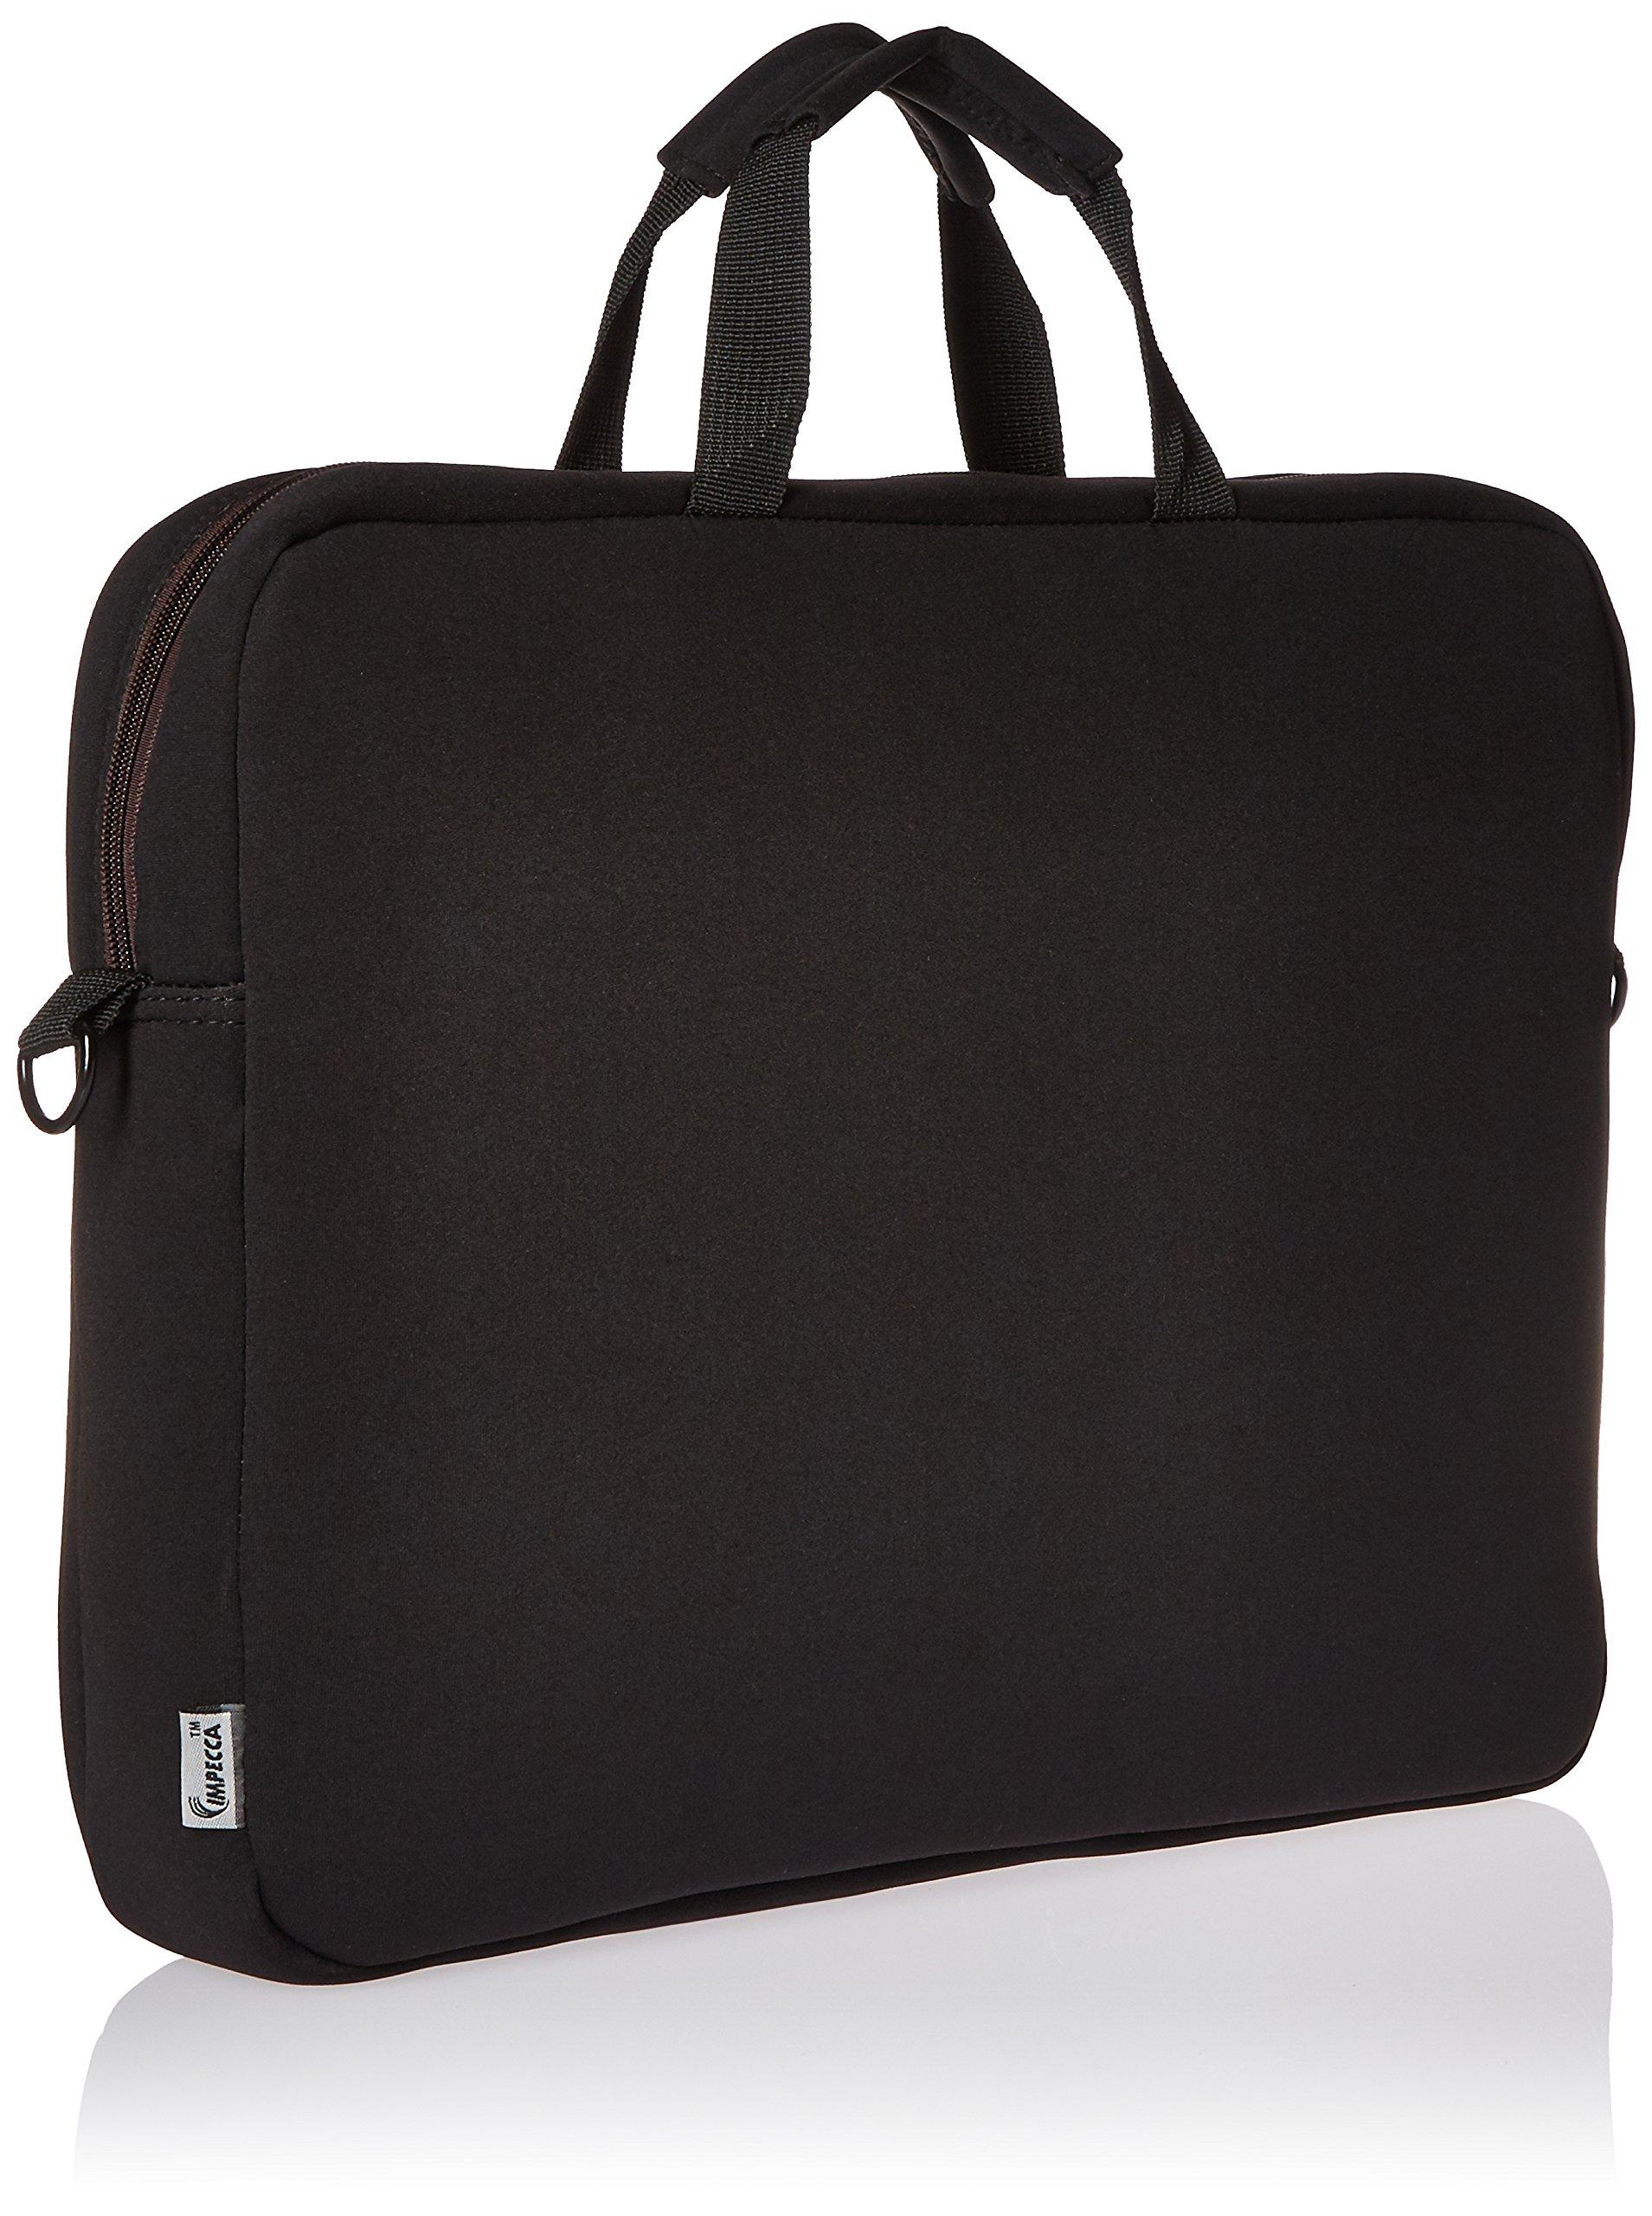 I Love NY Laptop Case, Black/Brown (ILNLAP1602BR) by I Love NY (Image #2)